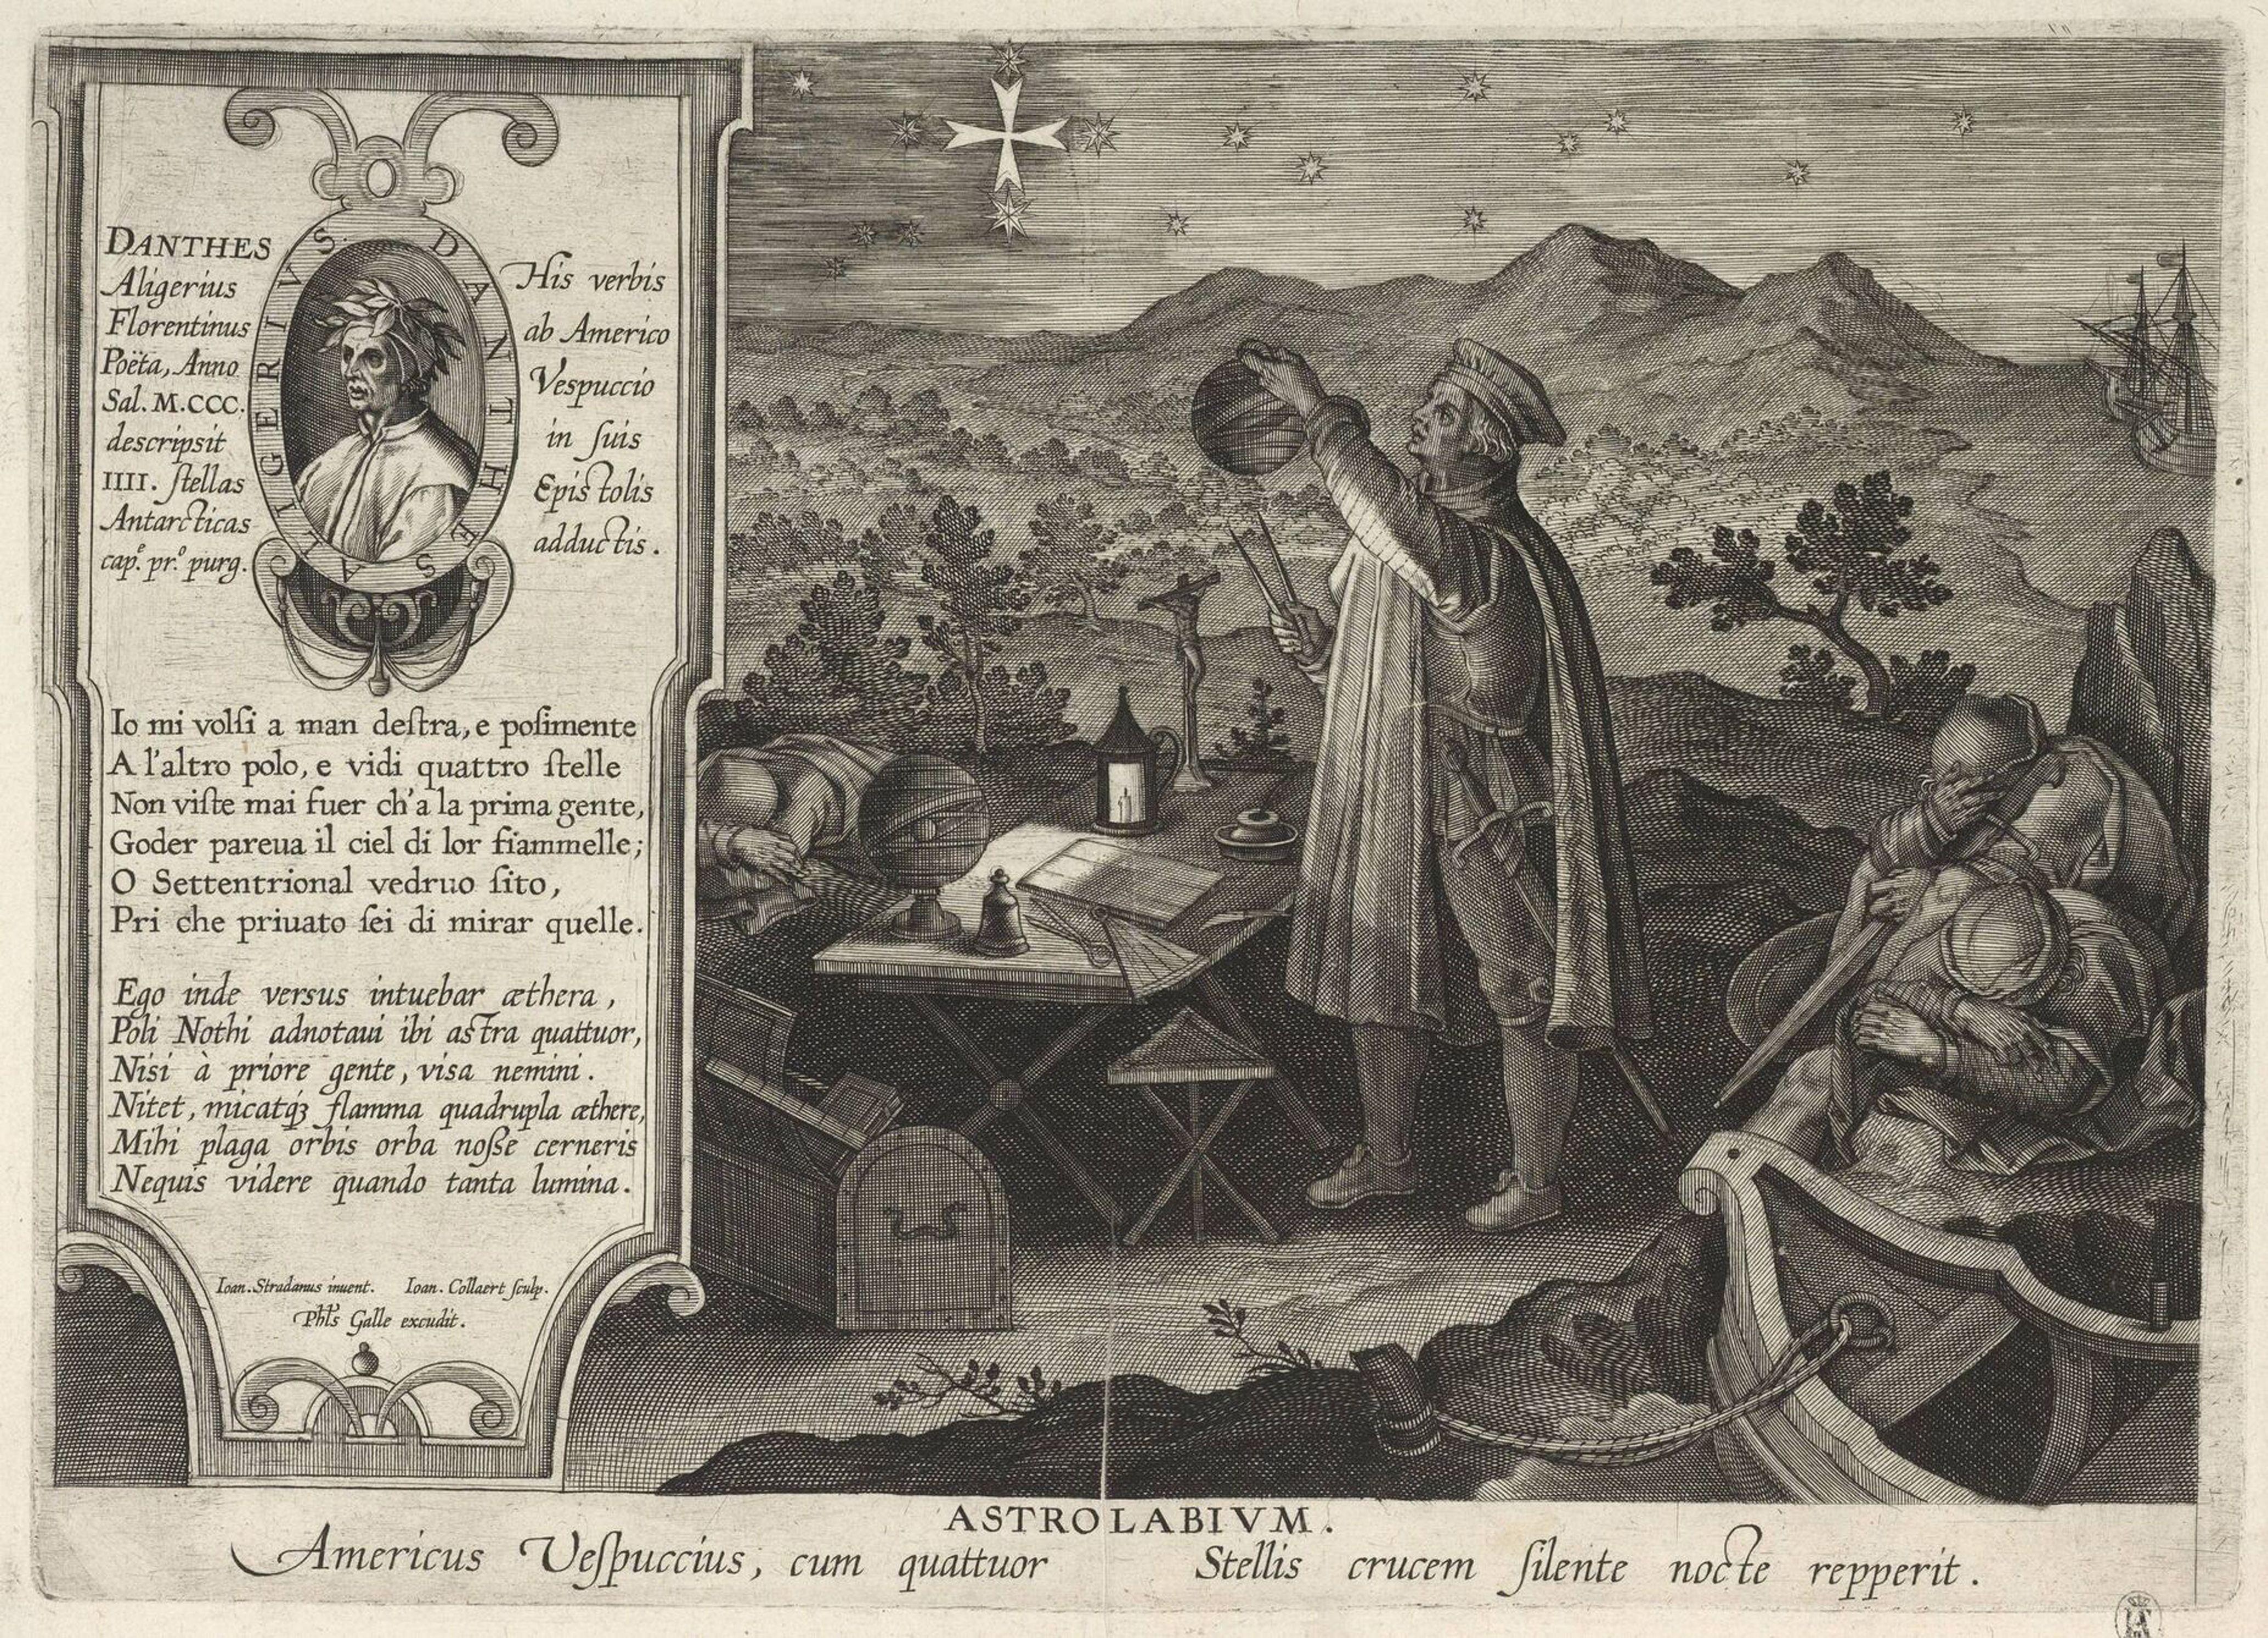 Amerigo Vespucci finding the Southern Cross constellation with an astrolabe (Americae Retectio), 1591. Artist: Galle, Philipp (1537-1612)